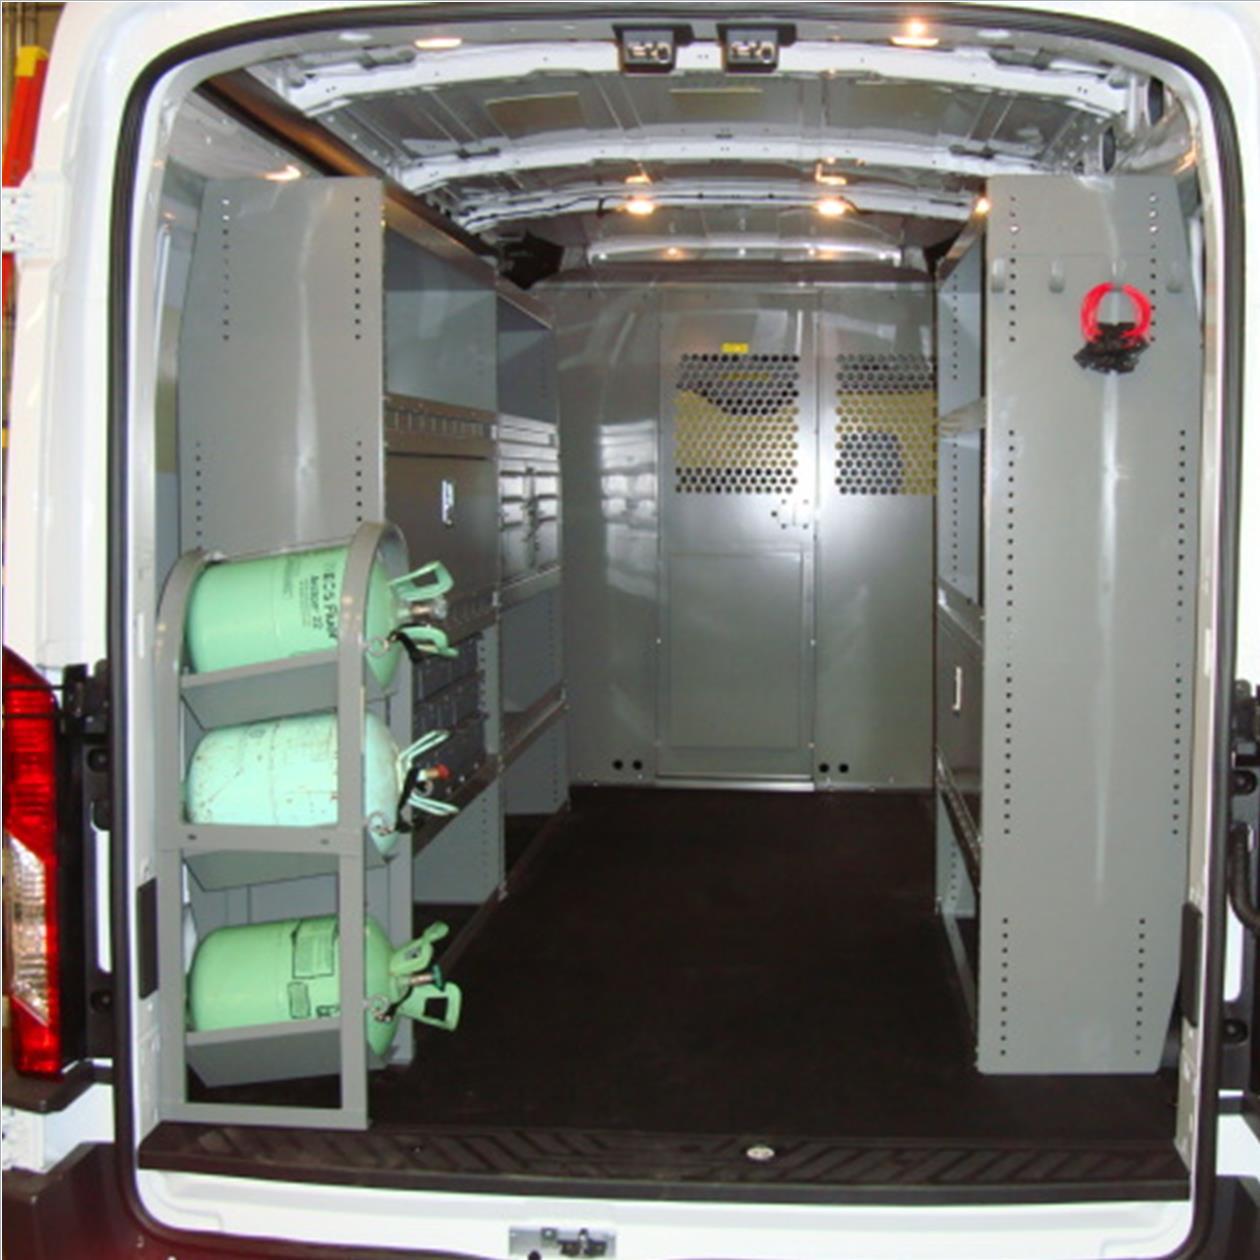 64857289bd Adrian Steel Commercial Van Interiors 144″ WB Mercedes Sprinter  HVAC Mechanical Service Package Low Roof